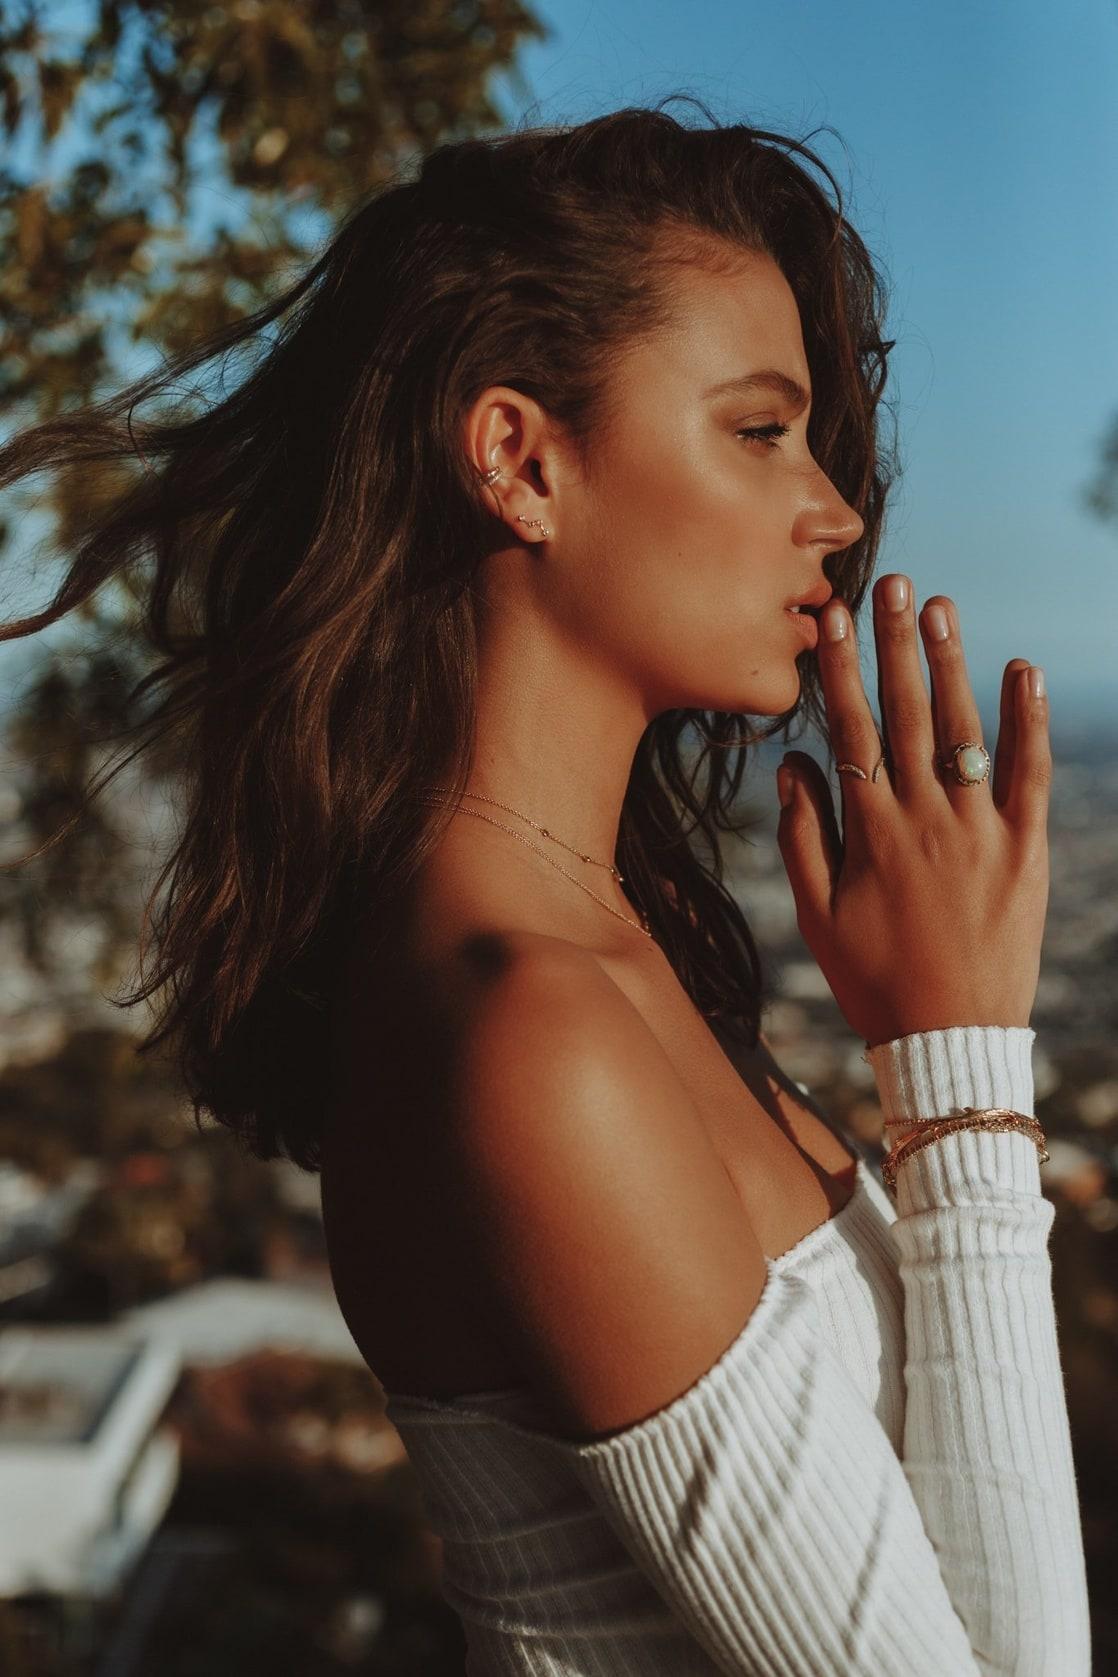 Paparazzi Virginie Ledoyen nude photos 2019